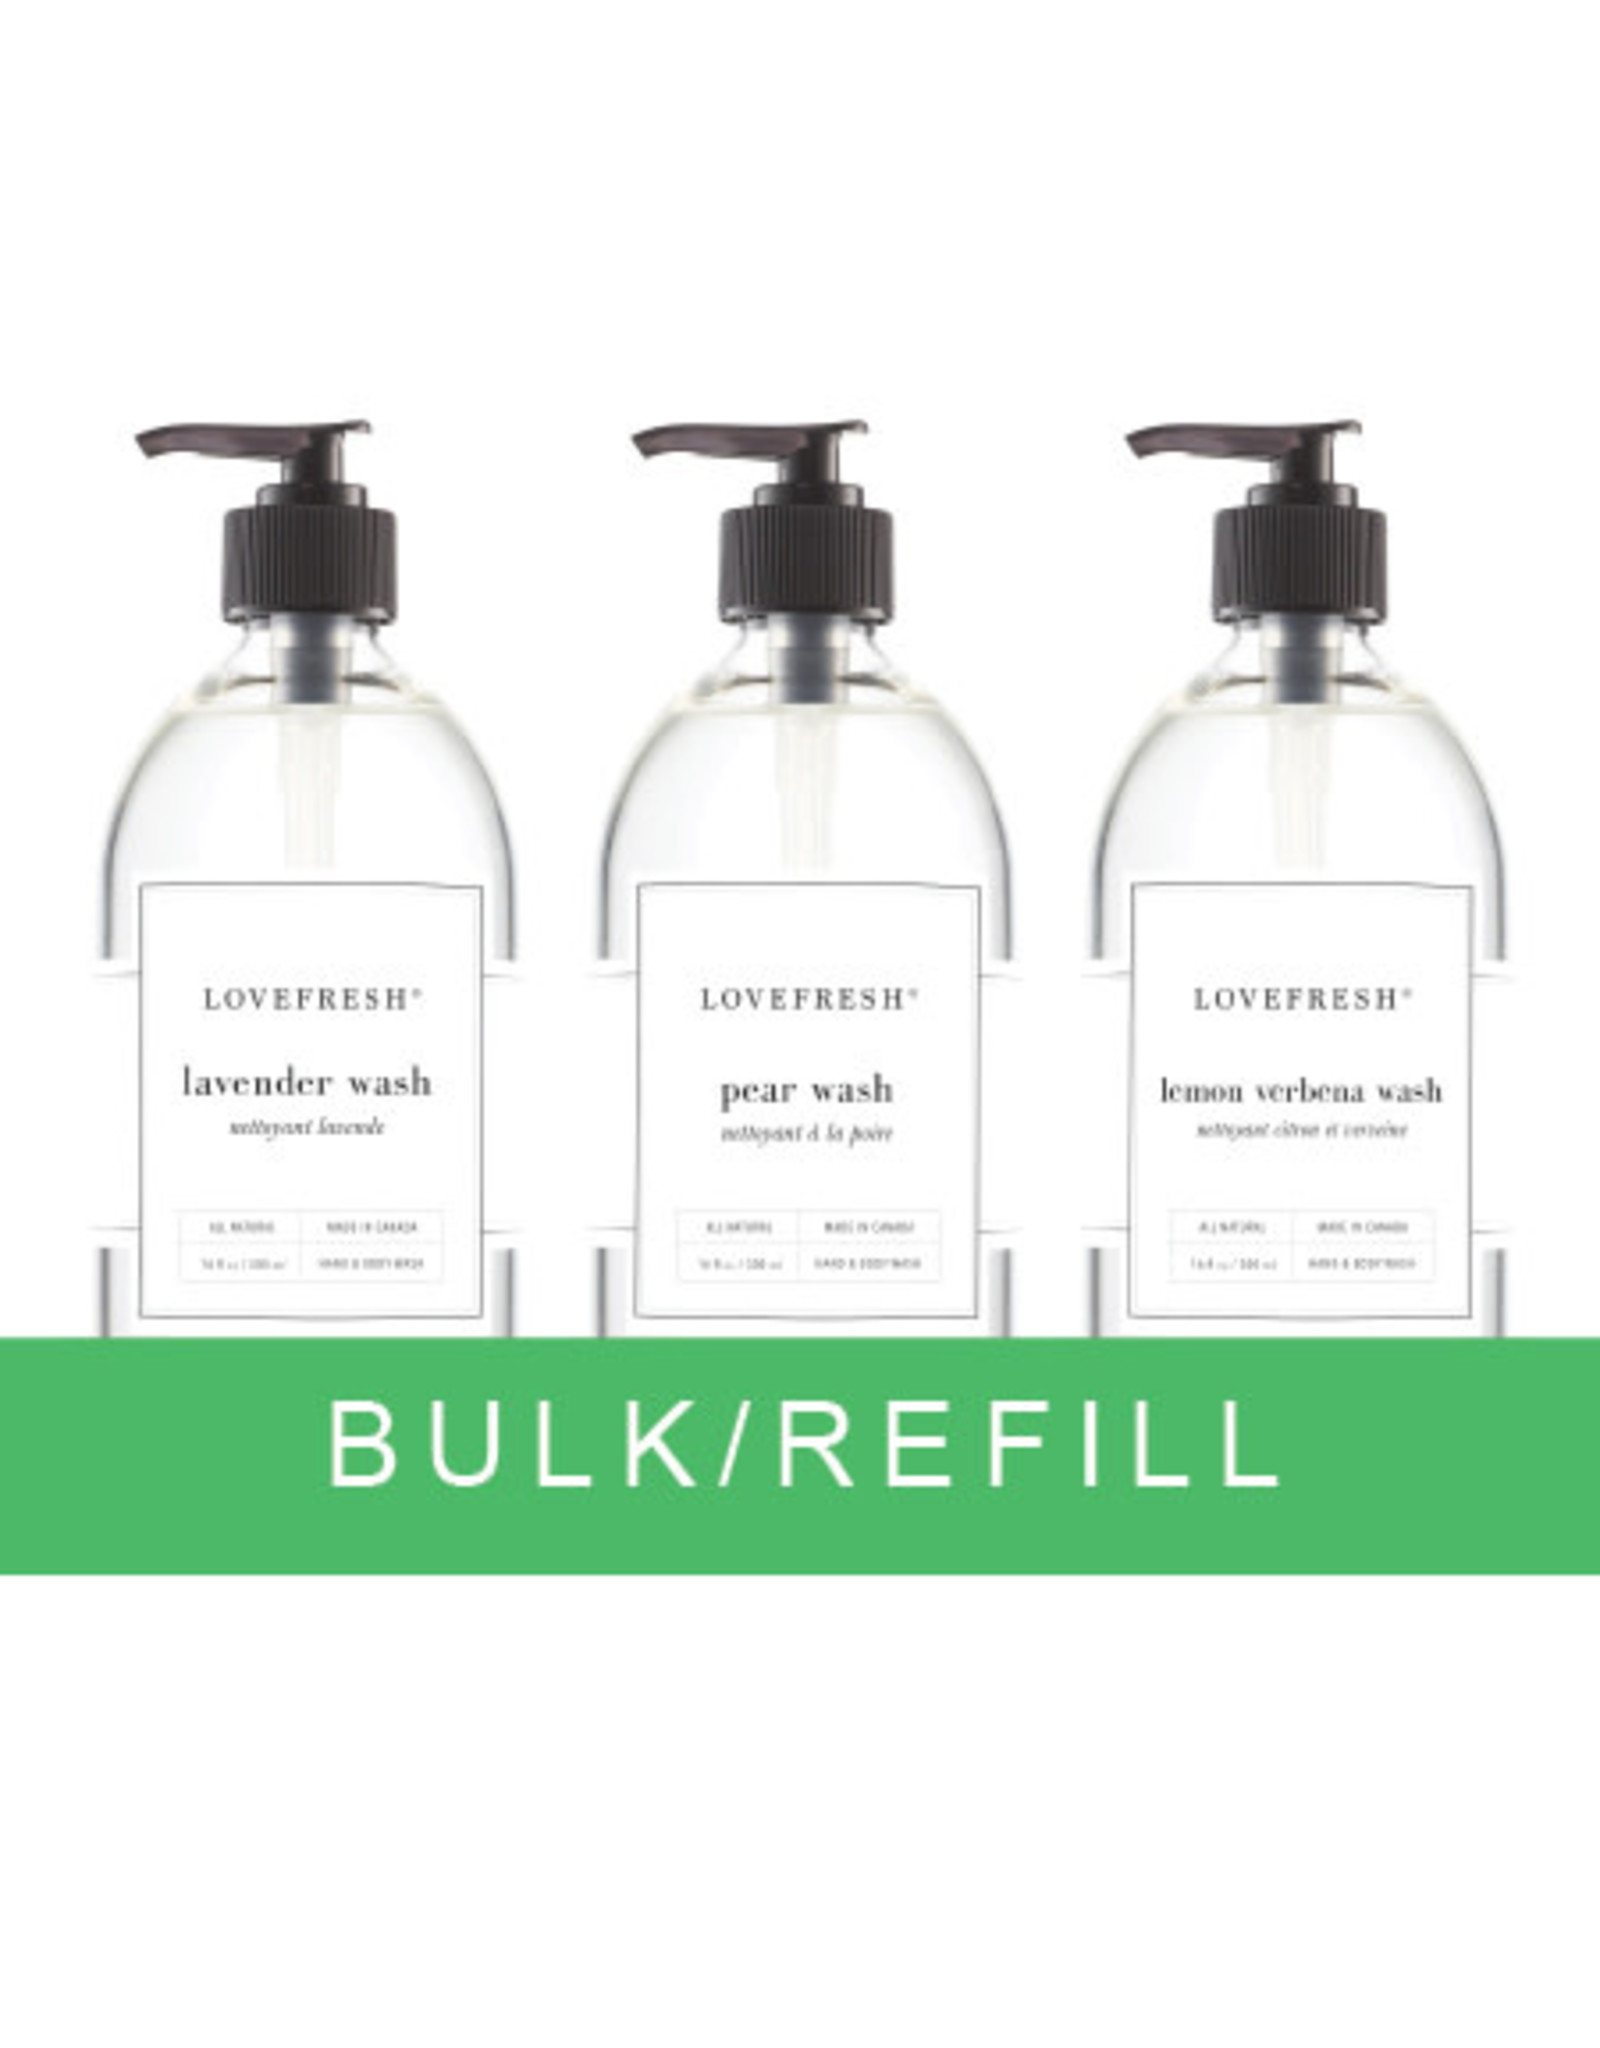 Lovefresh Hand & Body Wash Bulk / 100g